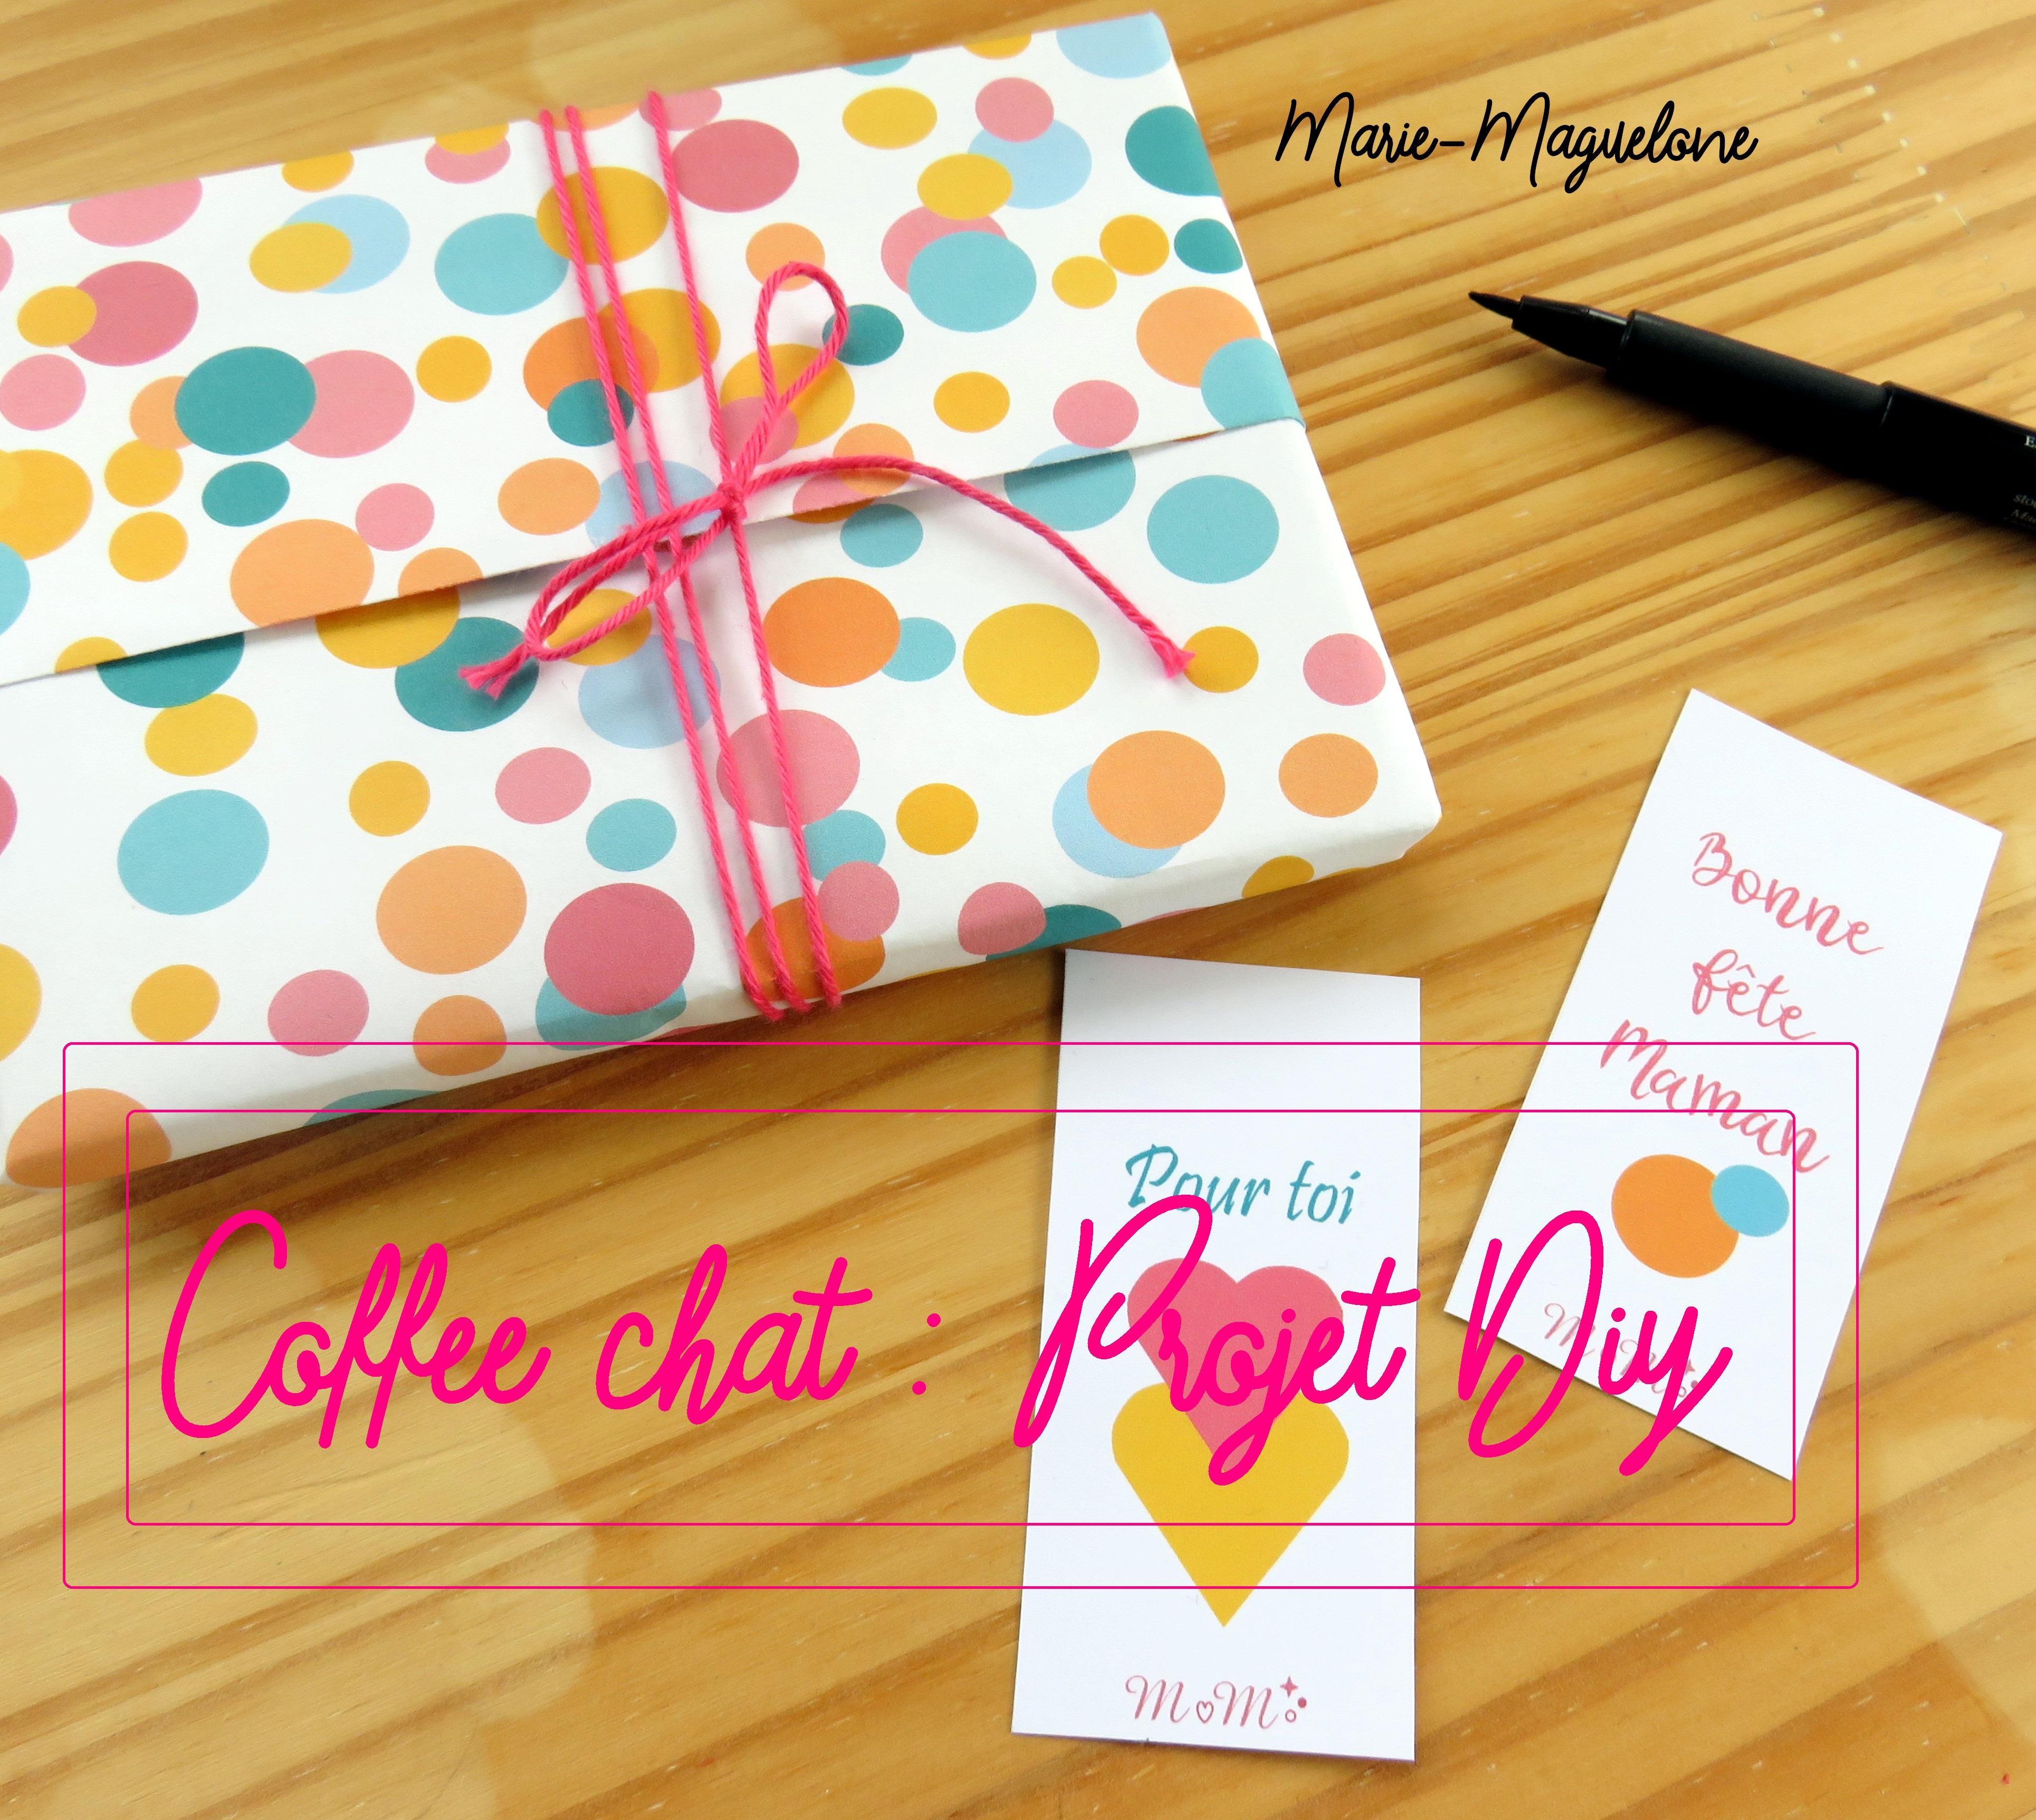 Coffee chat vidéo N°2 : projet DIY !